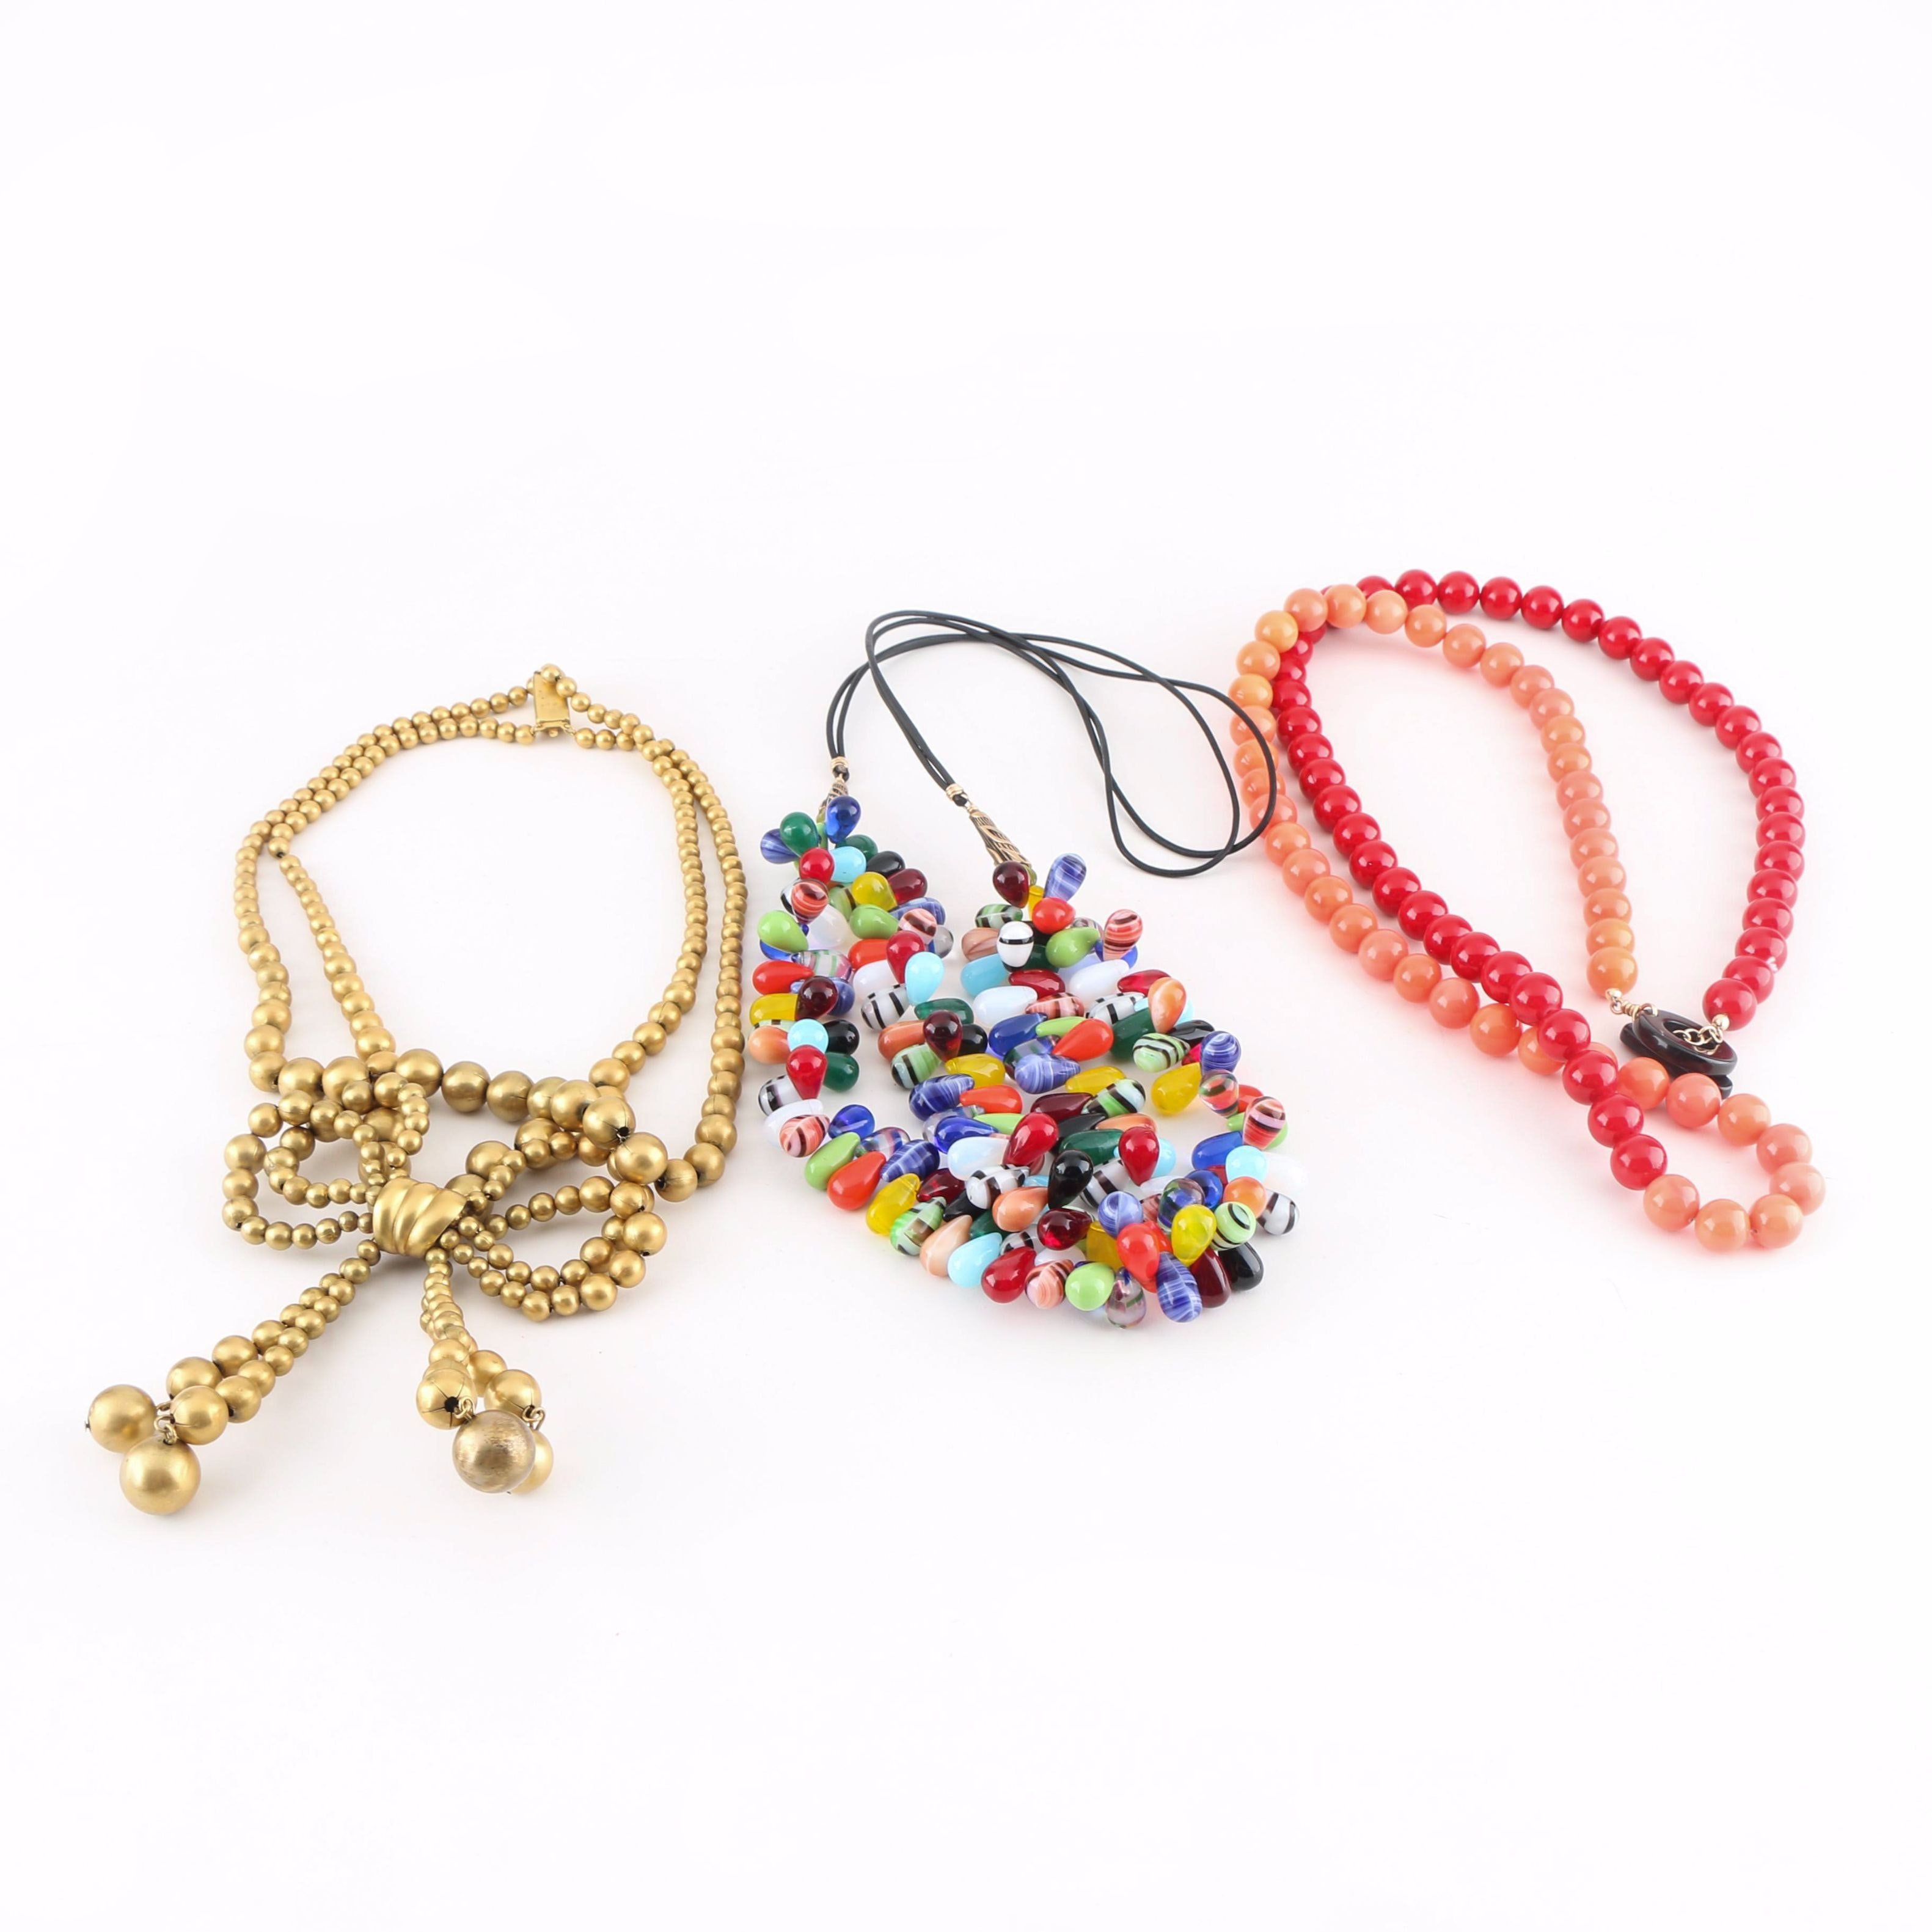 Beaded Necklace Assortment